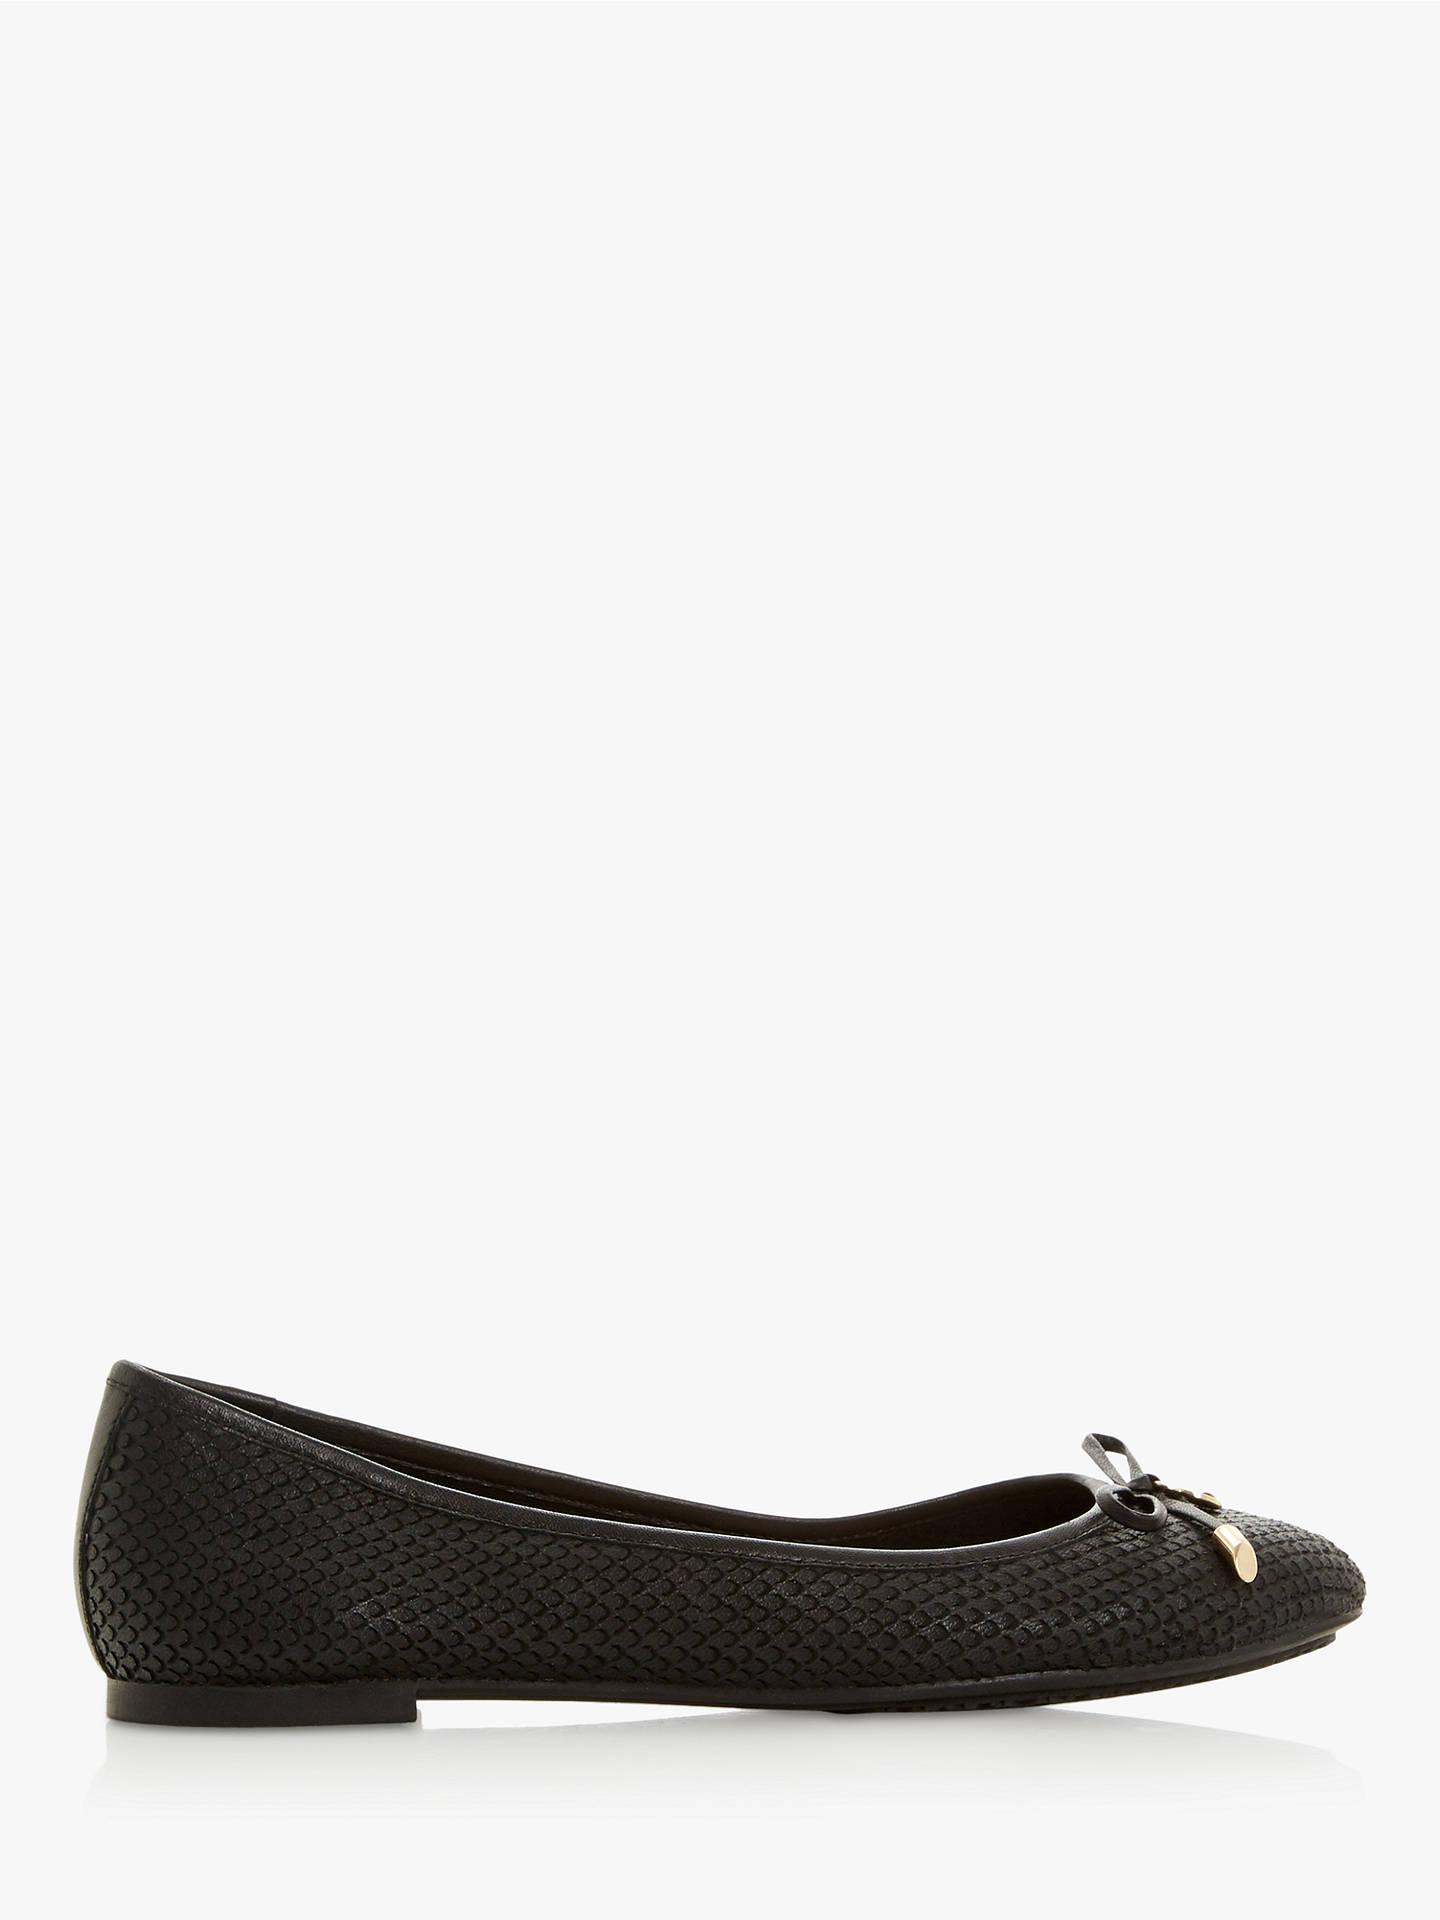 diverse styles purchase cheap fantastic savings Dune Wide Fit Harpar Bow Detail Ballerina Pumps, Black Leather